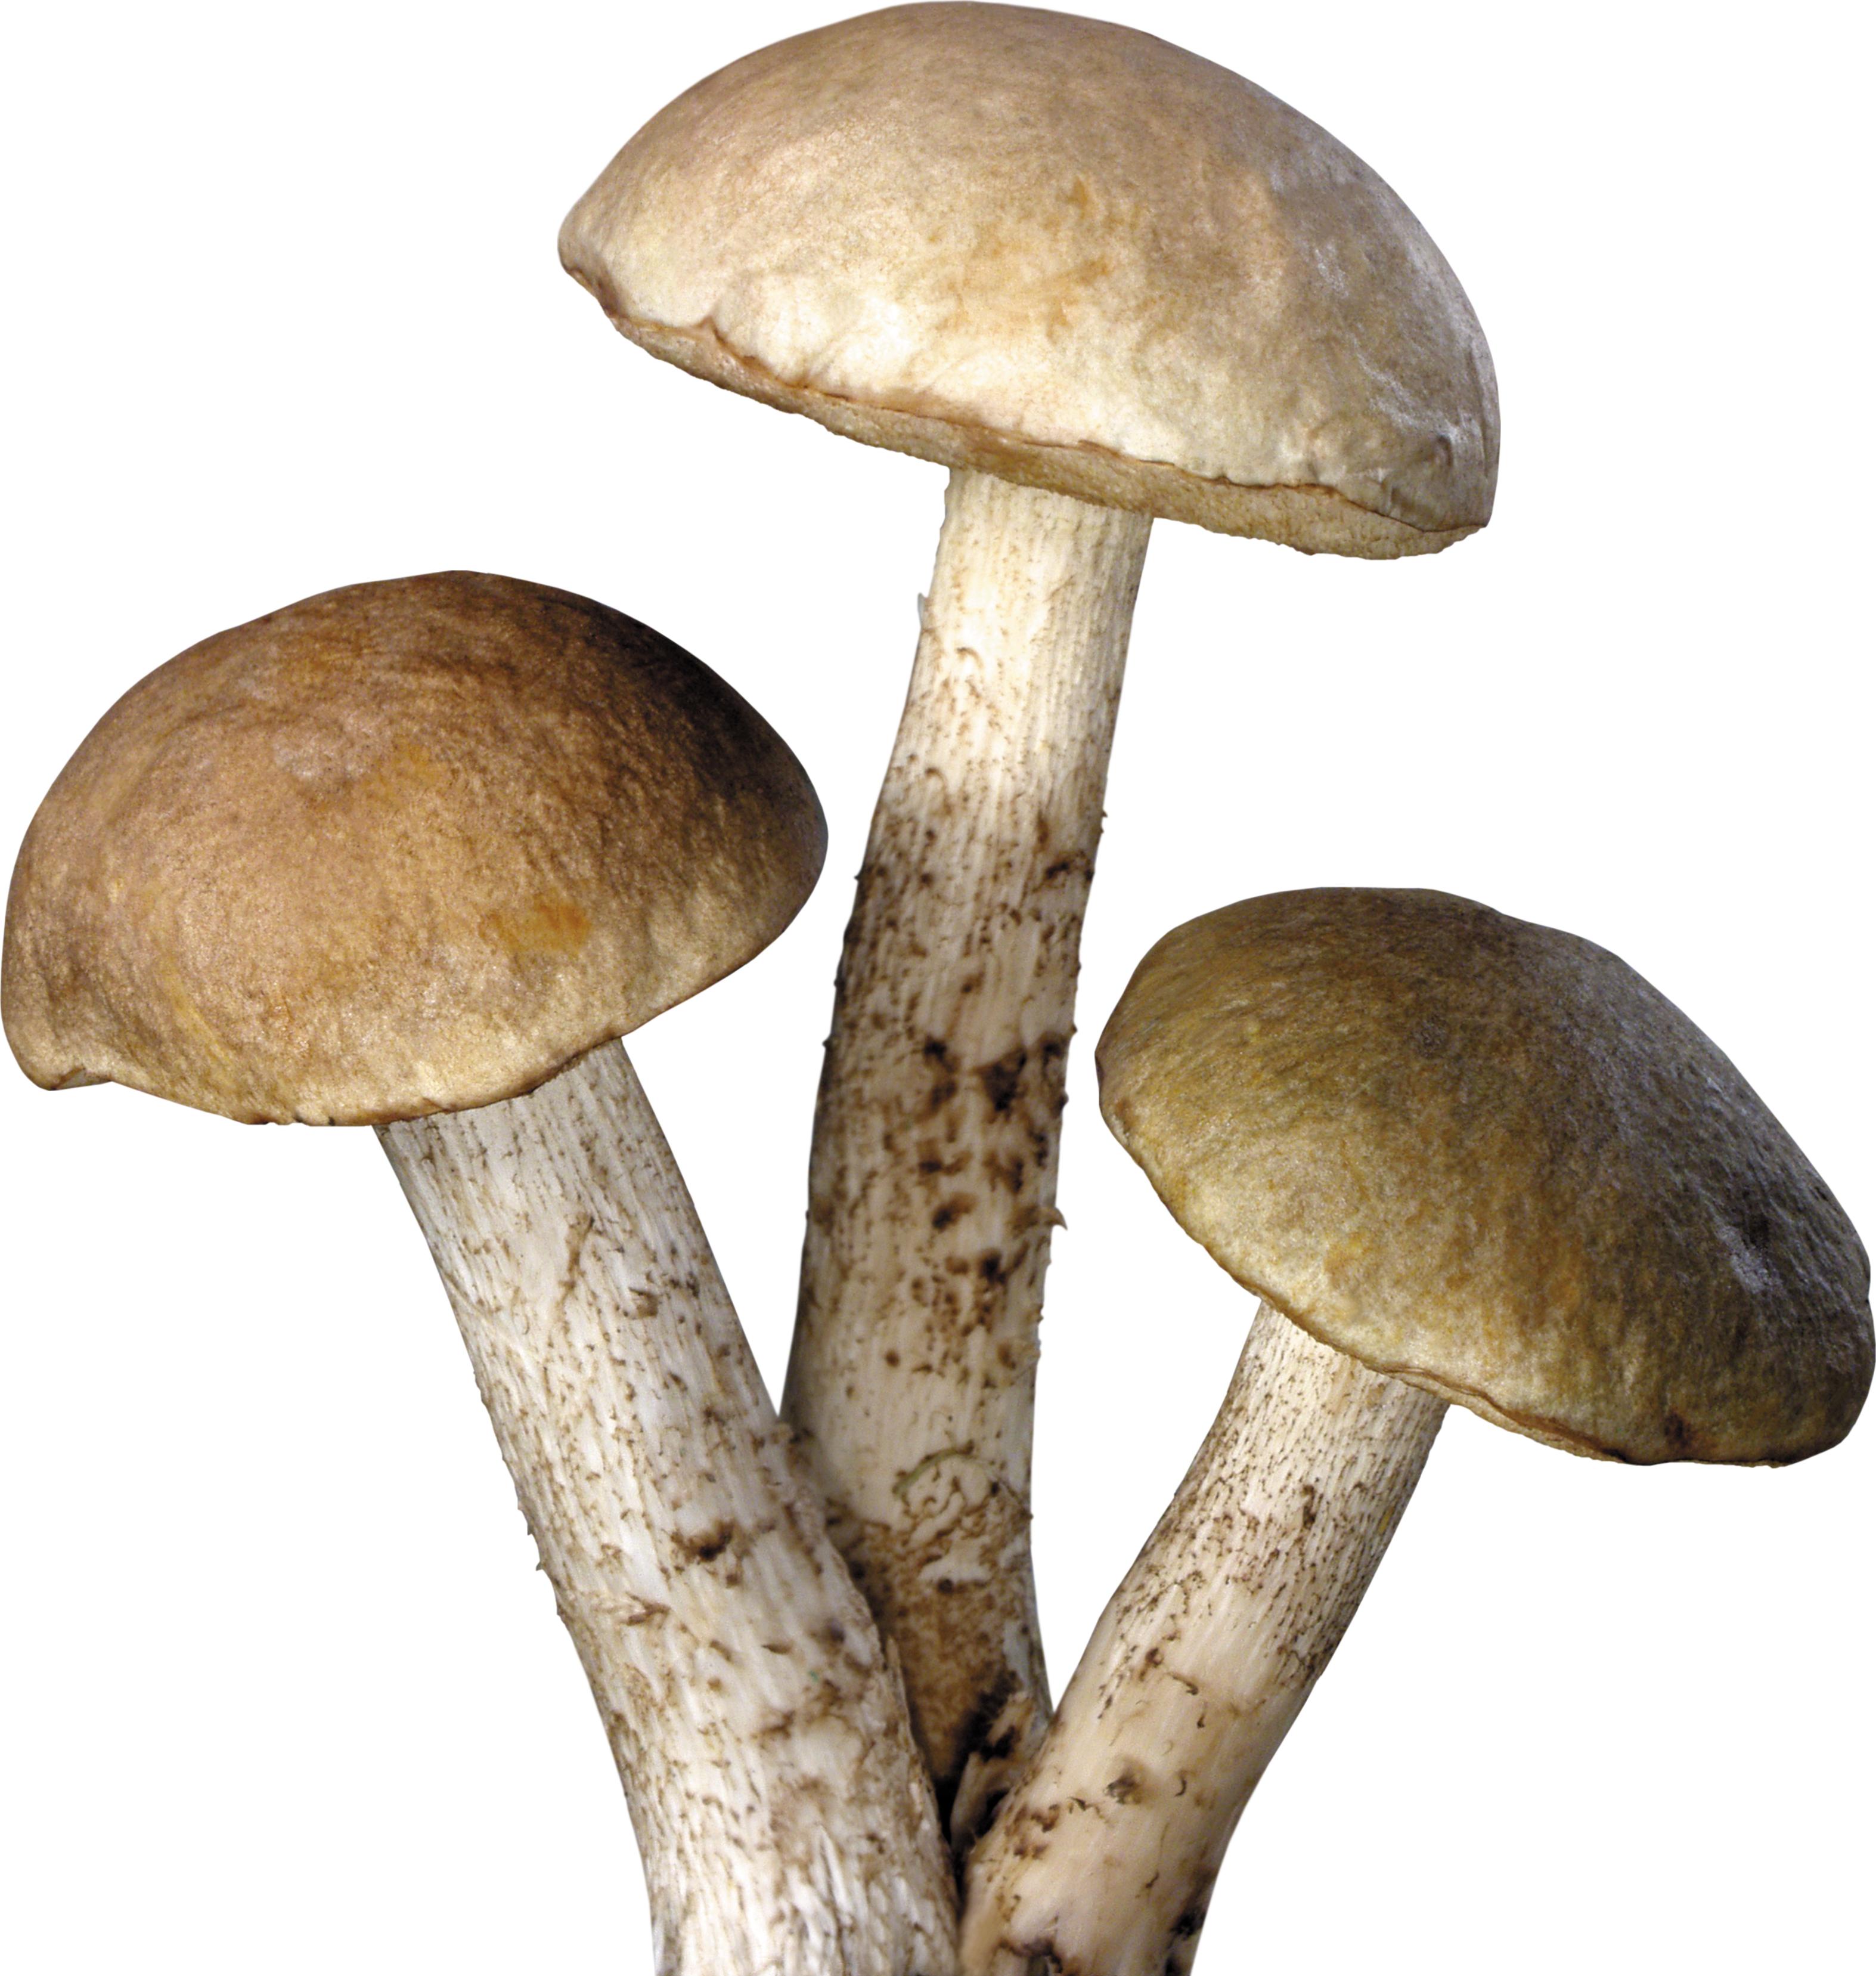 Mushroom PNG image - Fungi PNG HD